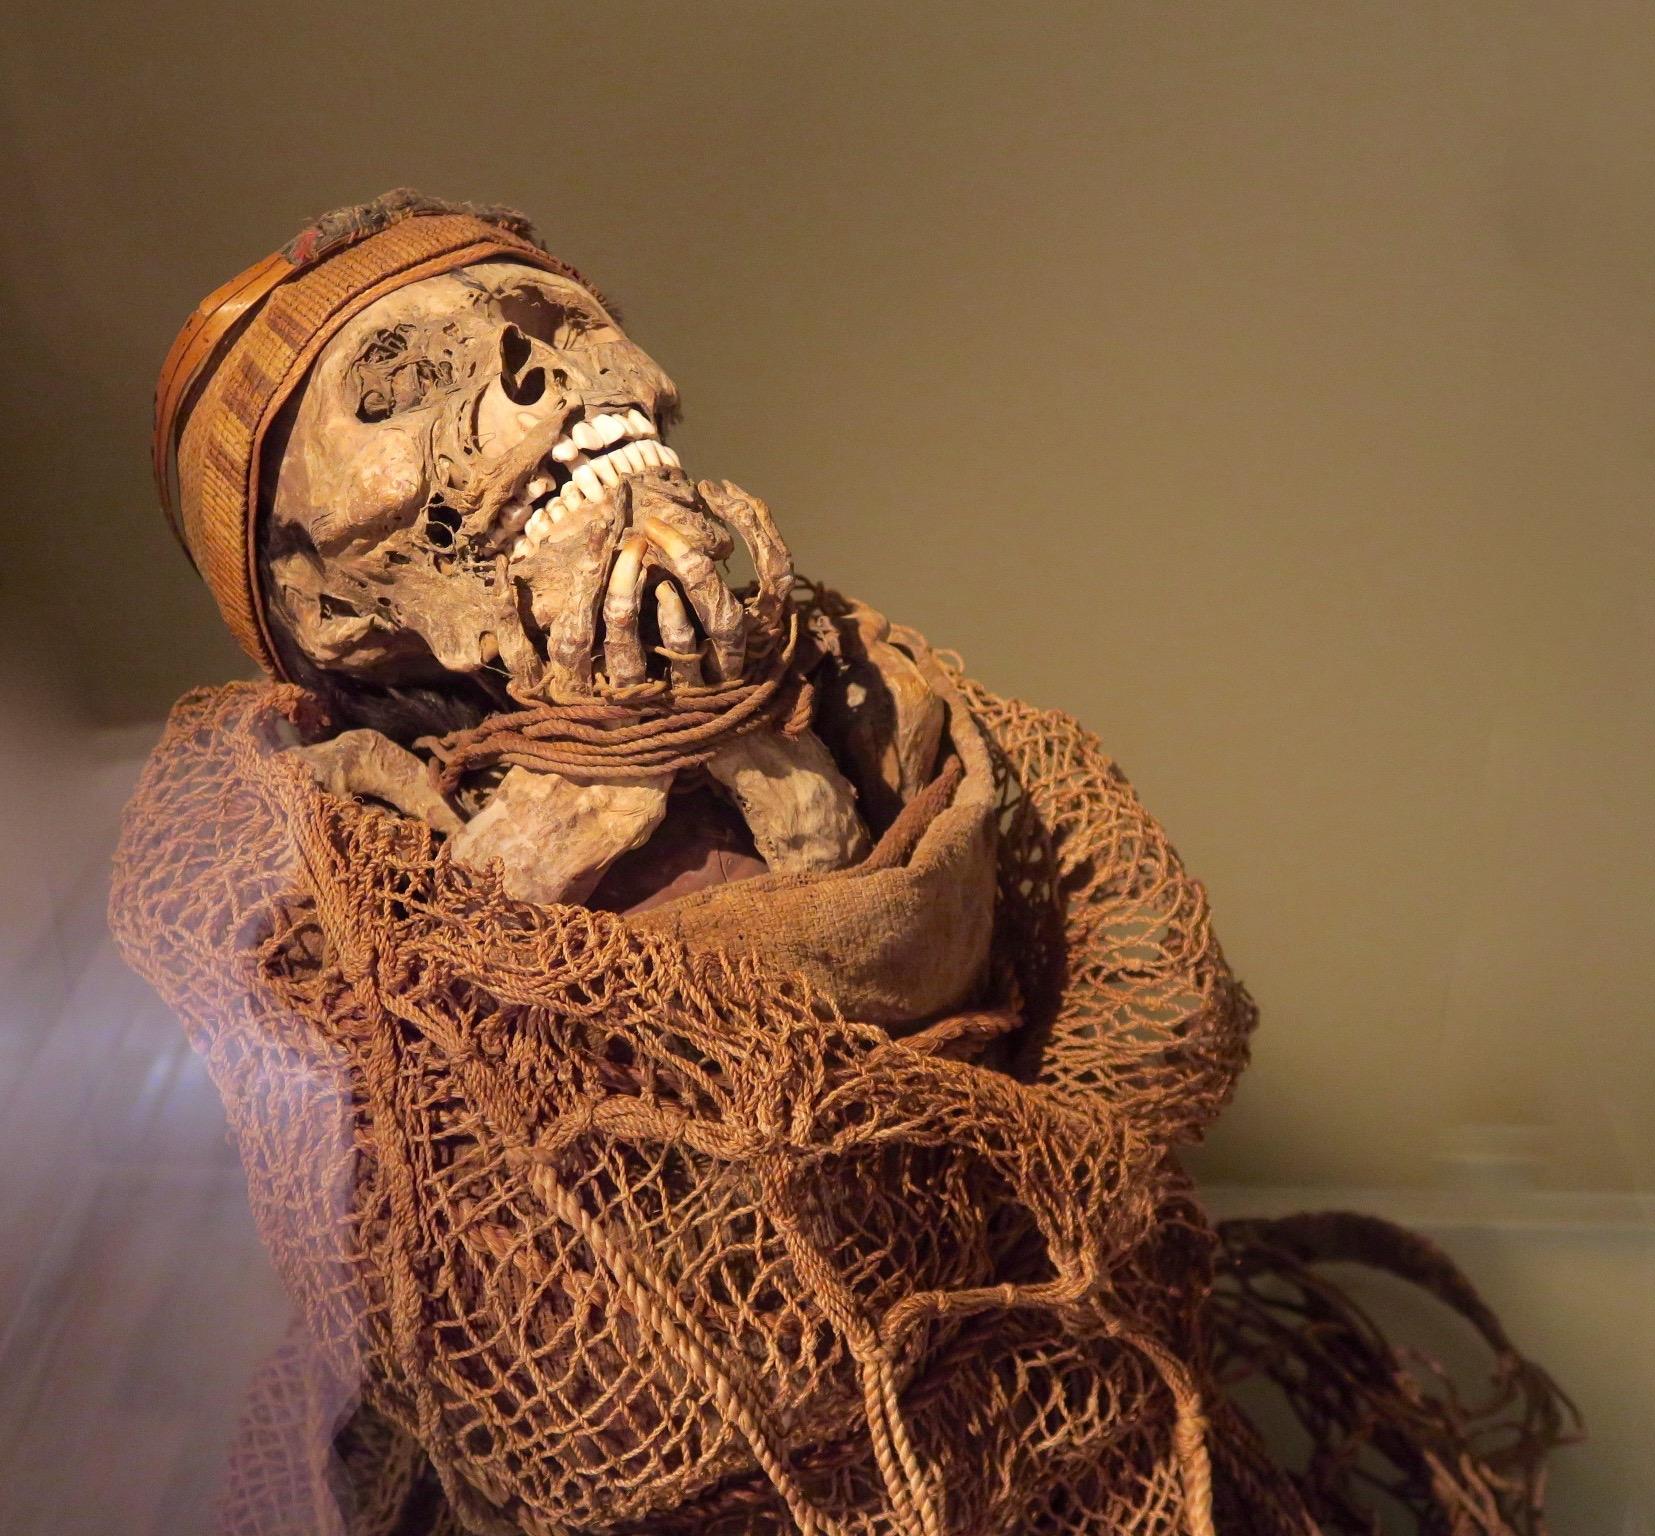 Muisca Mummy, Gold Museum